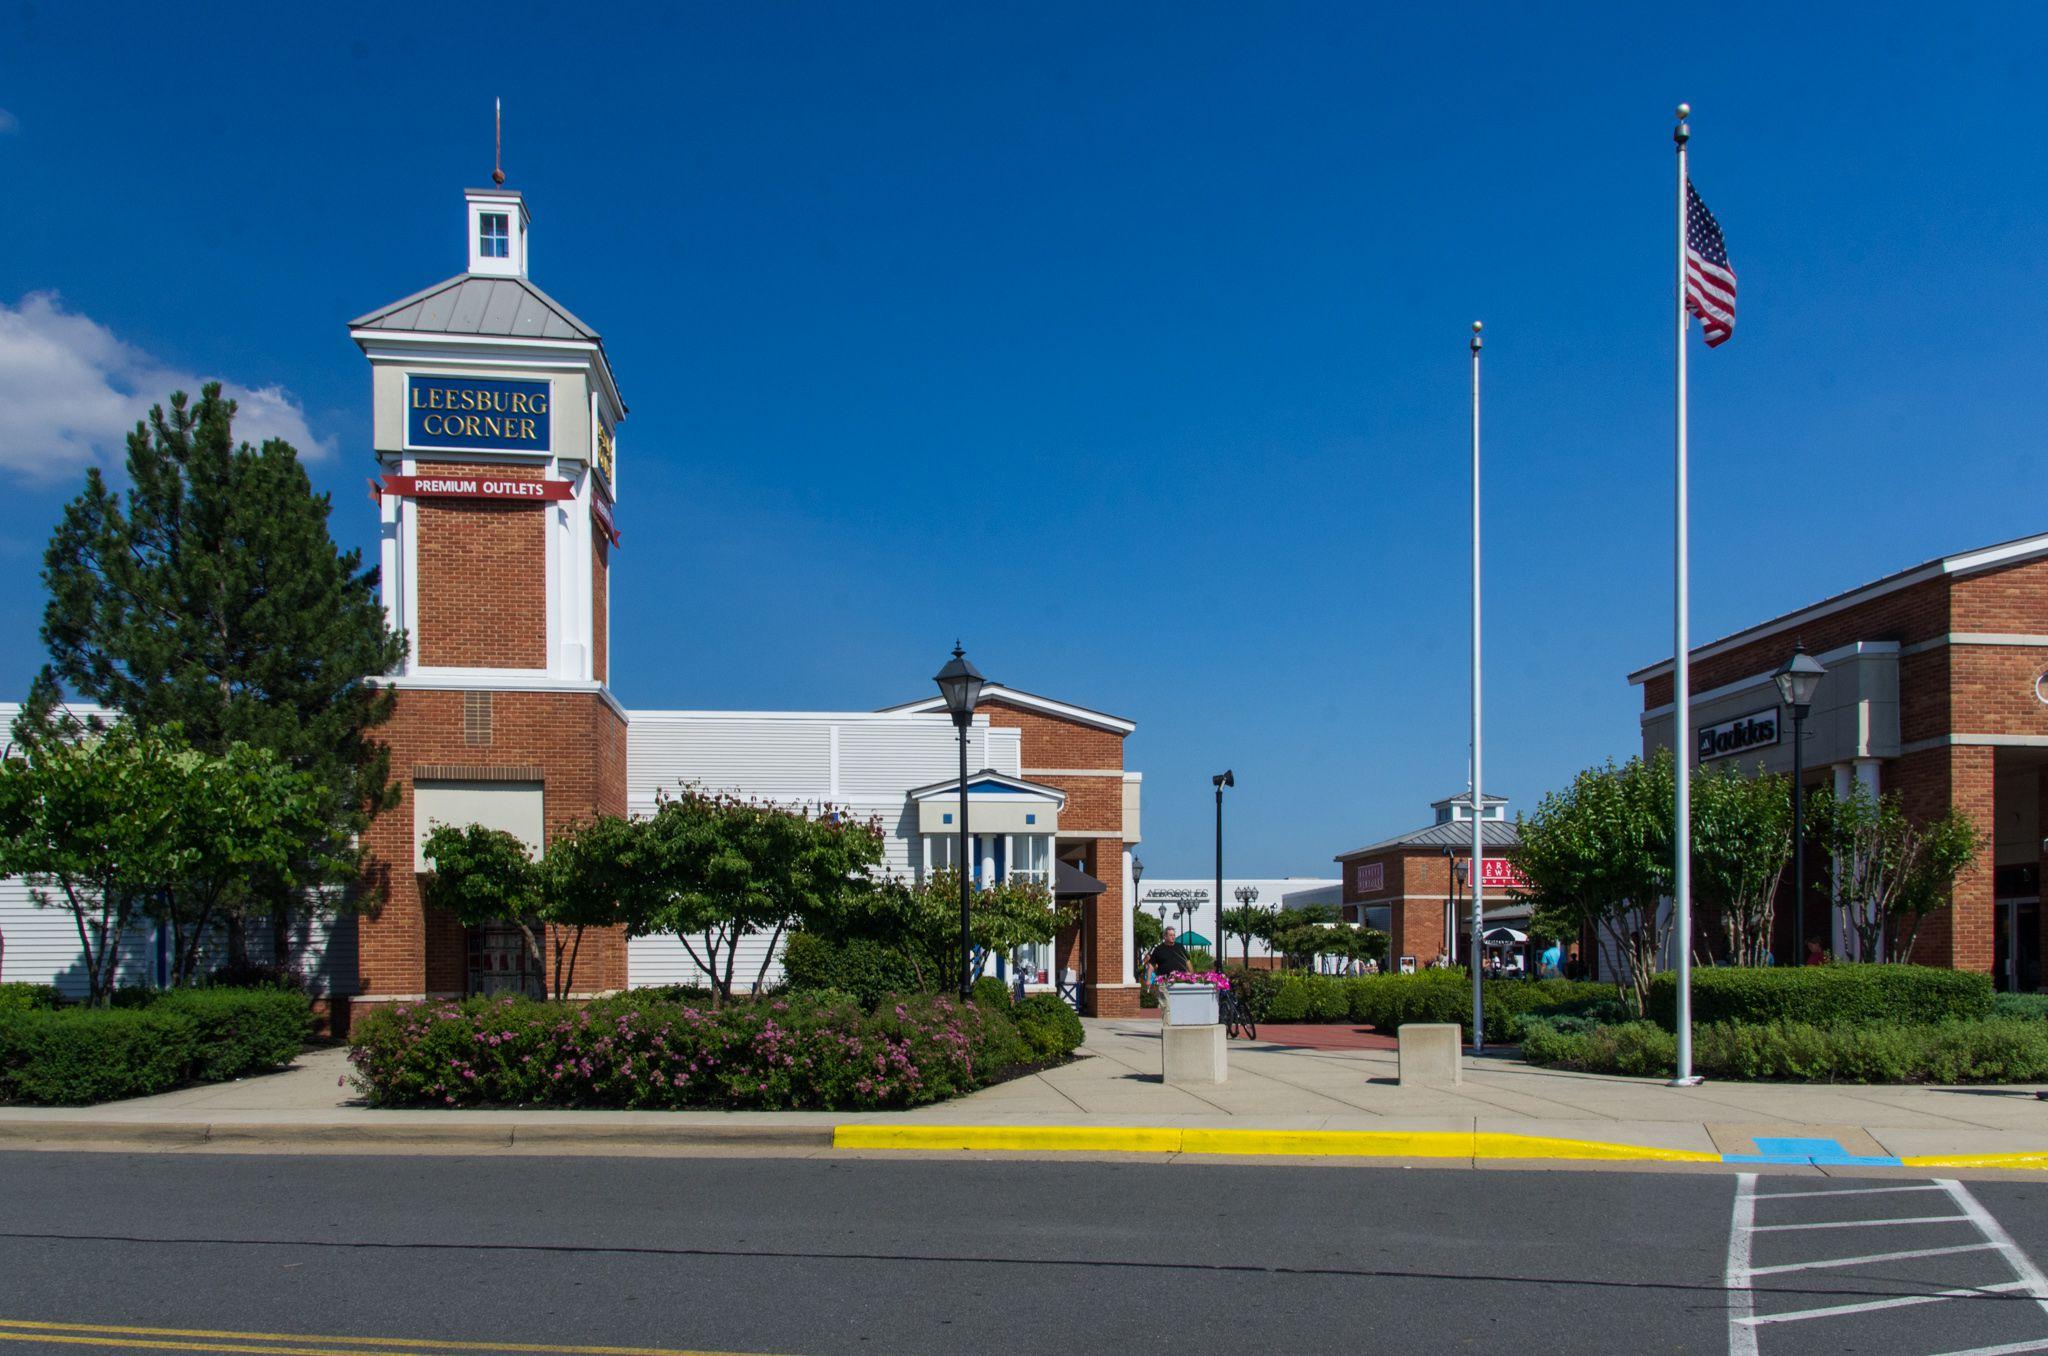 Leesburg Corner Premium Outlets In Leesburg Va